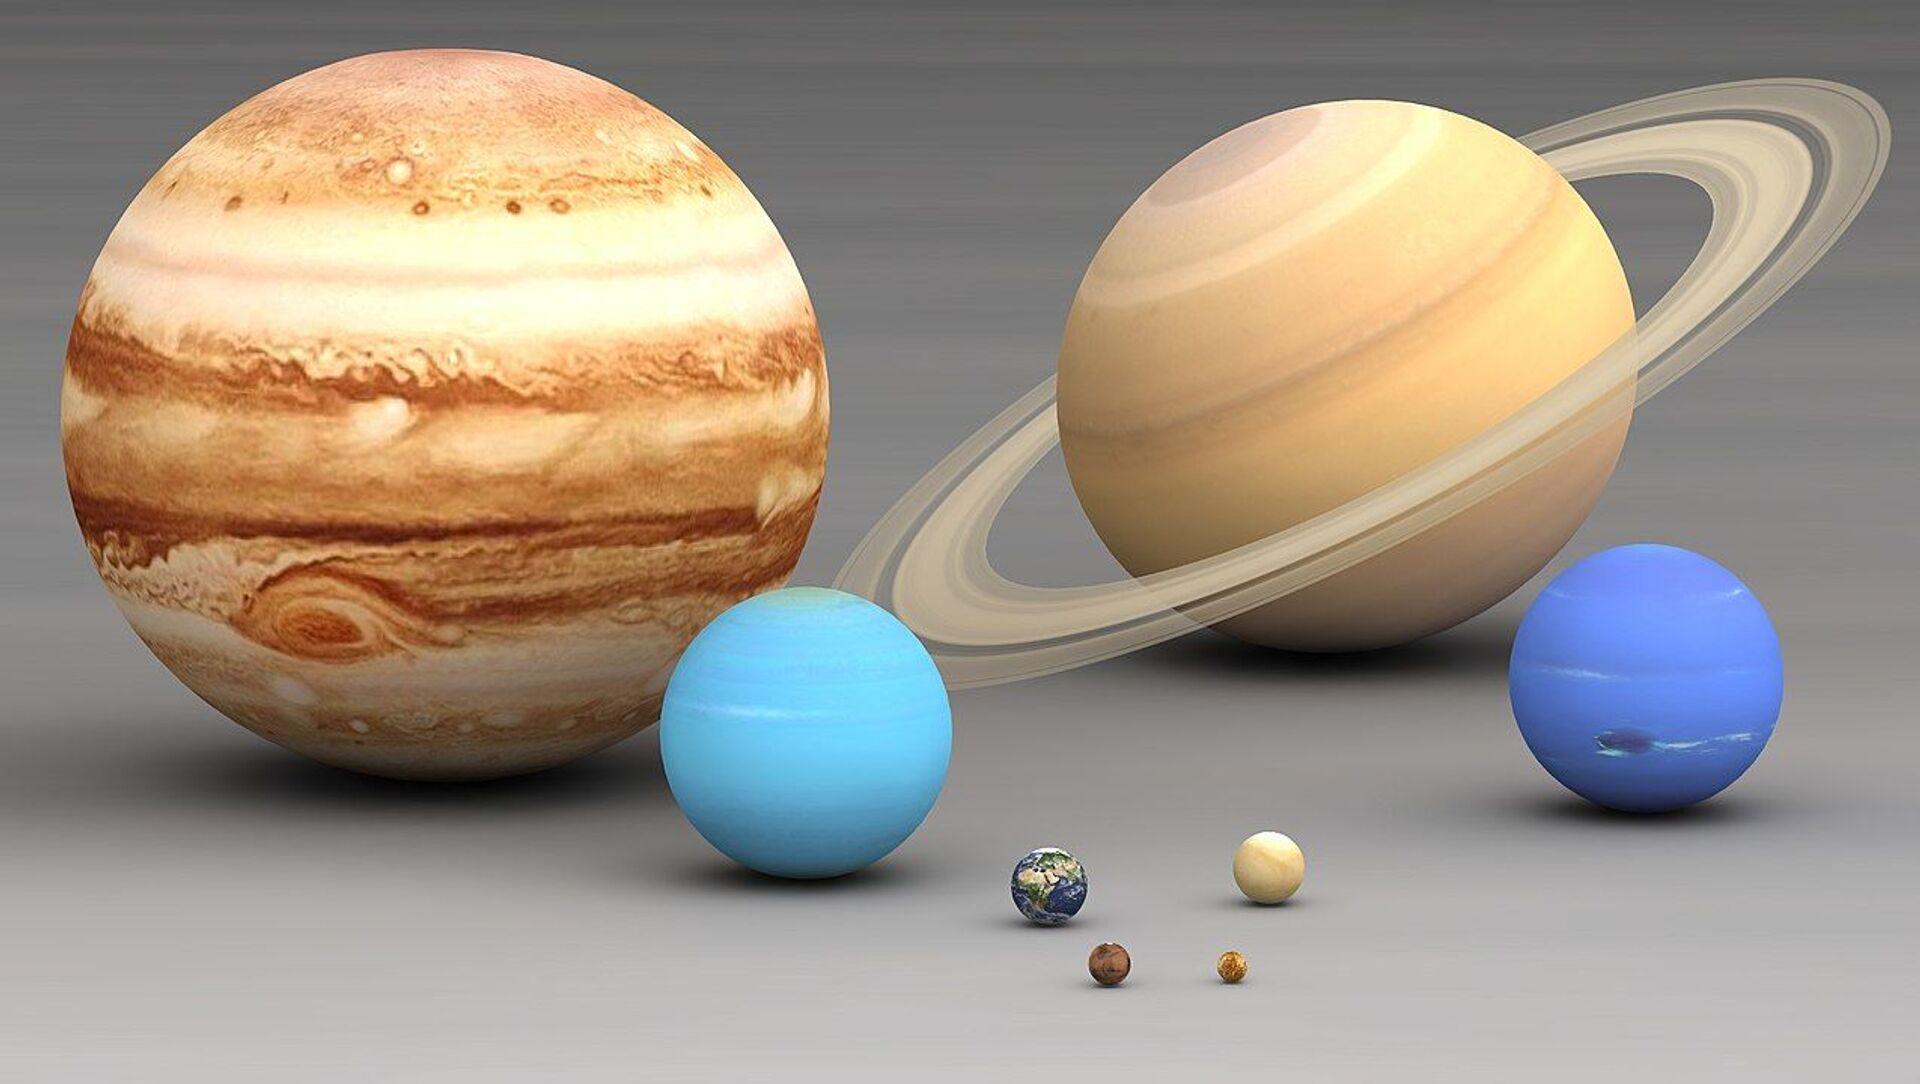 Solar system planets size comparison. Largest to smallest are pictured left to right, top to bottom: Jupiter, Saturn, Uranus, Neptune, Earth, Venus, Mars, Mercury - Sputnik International, 1920, 29.07.2021